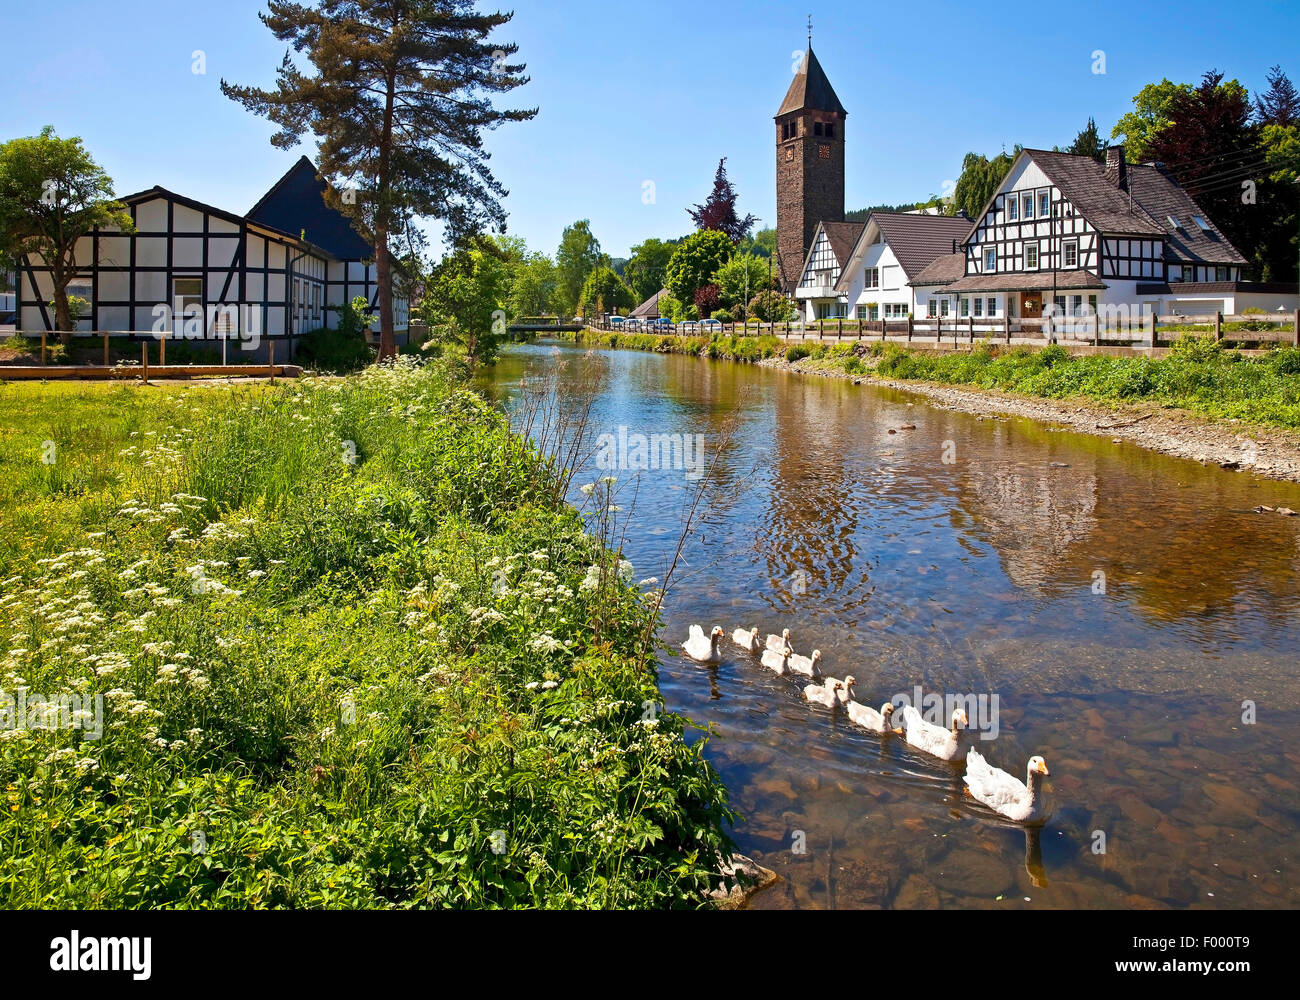 River Lenne district Saalhausen, Germany, North Rhine-Westphalia, Sauerland, Lennestadt - Stock Image